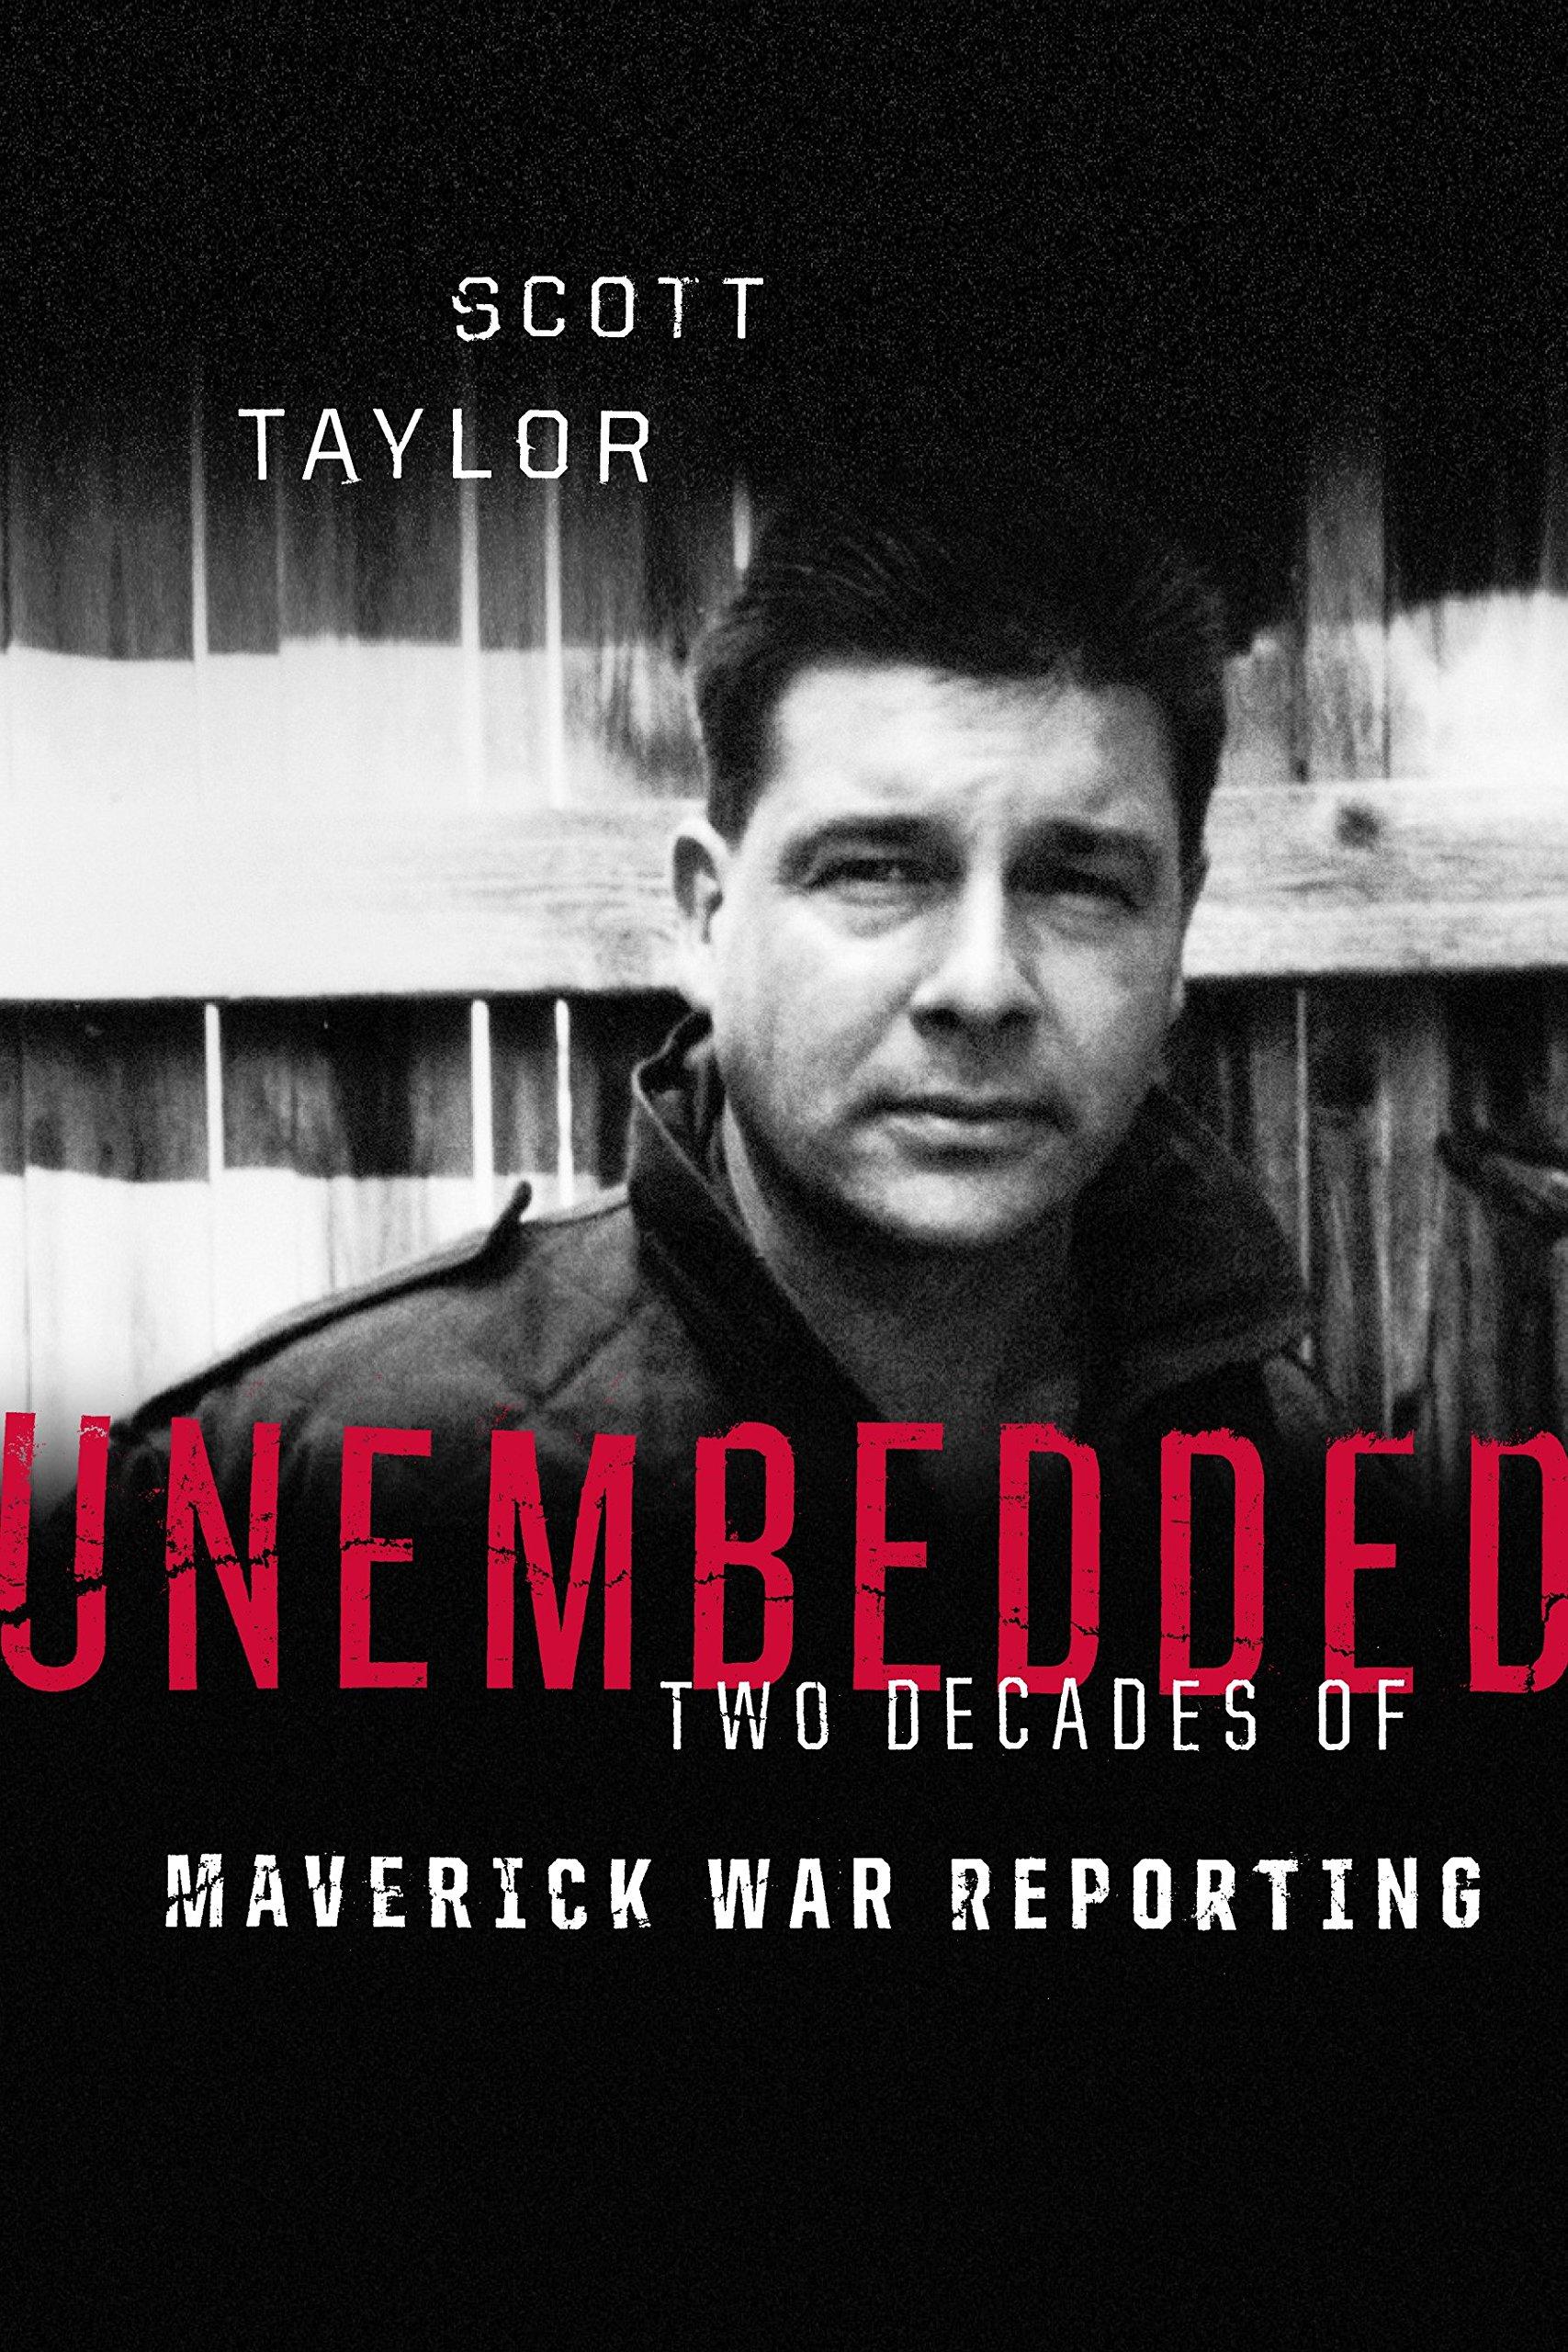 Unembedded: Two Decades of Maverick War Reporting: Scott Taylor:  9781553652922: Amazon.com: Books